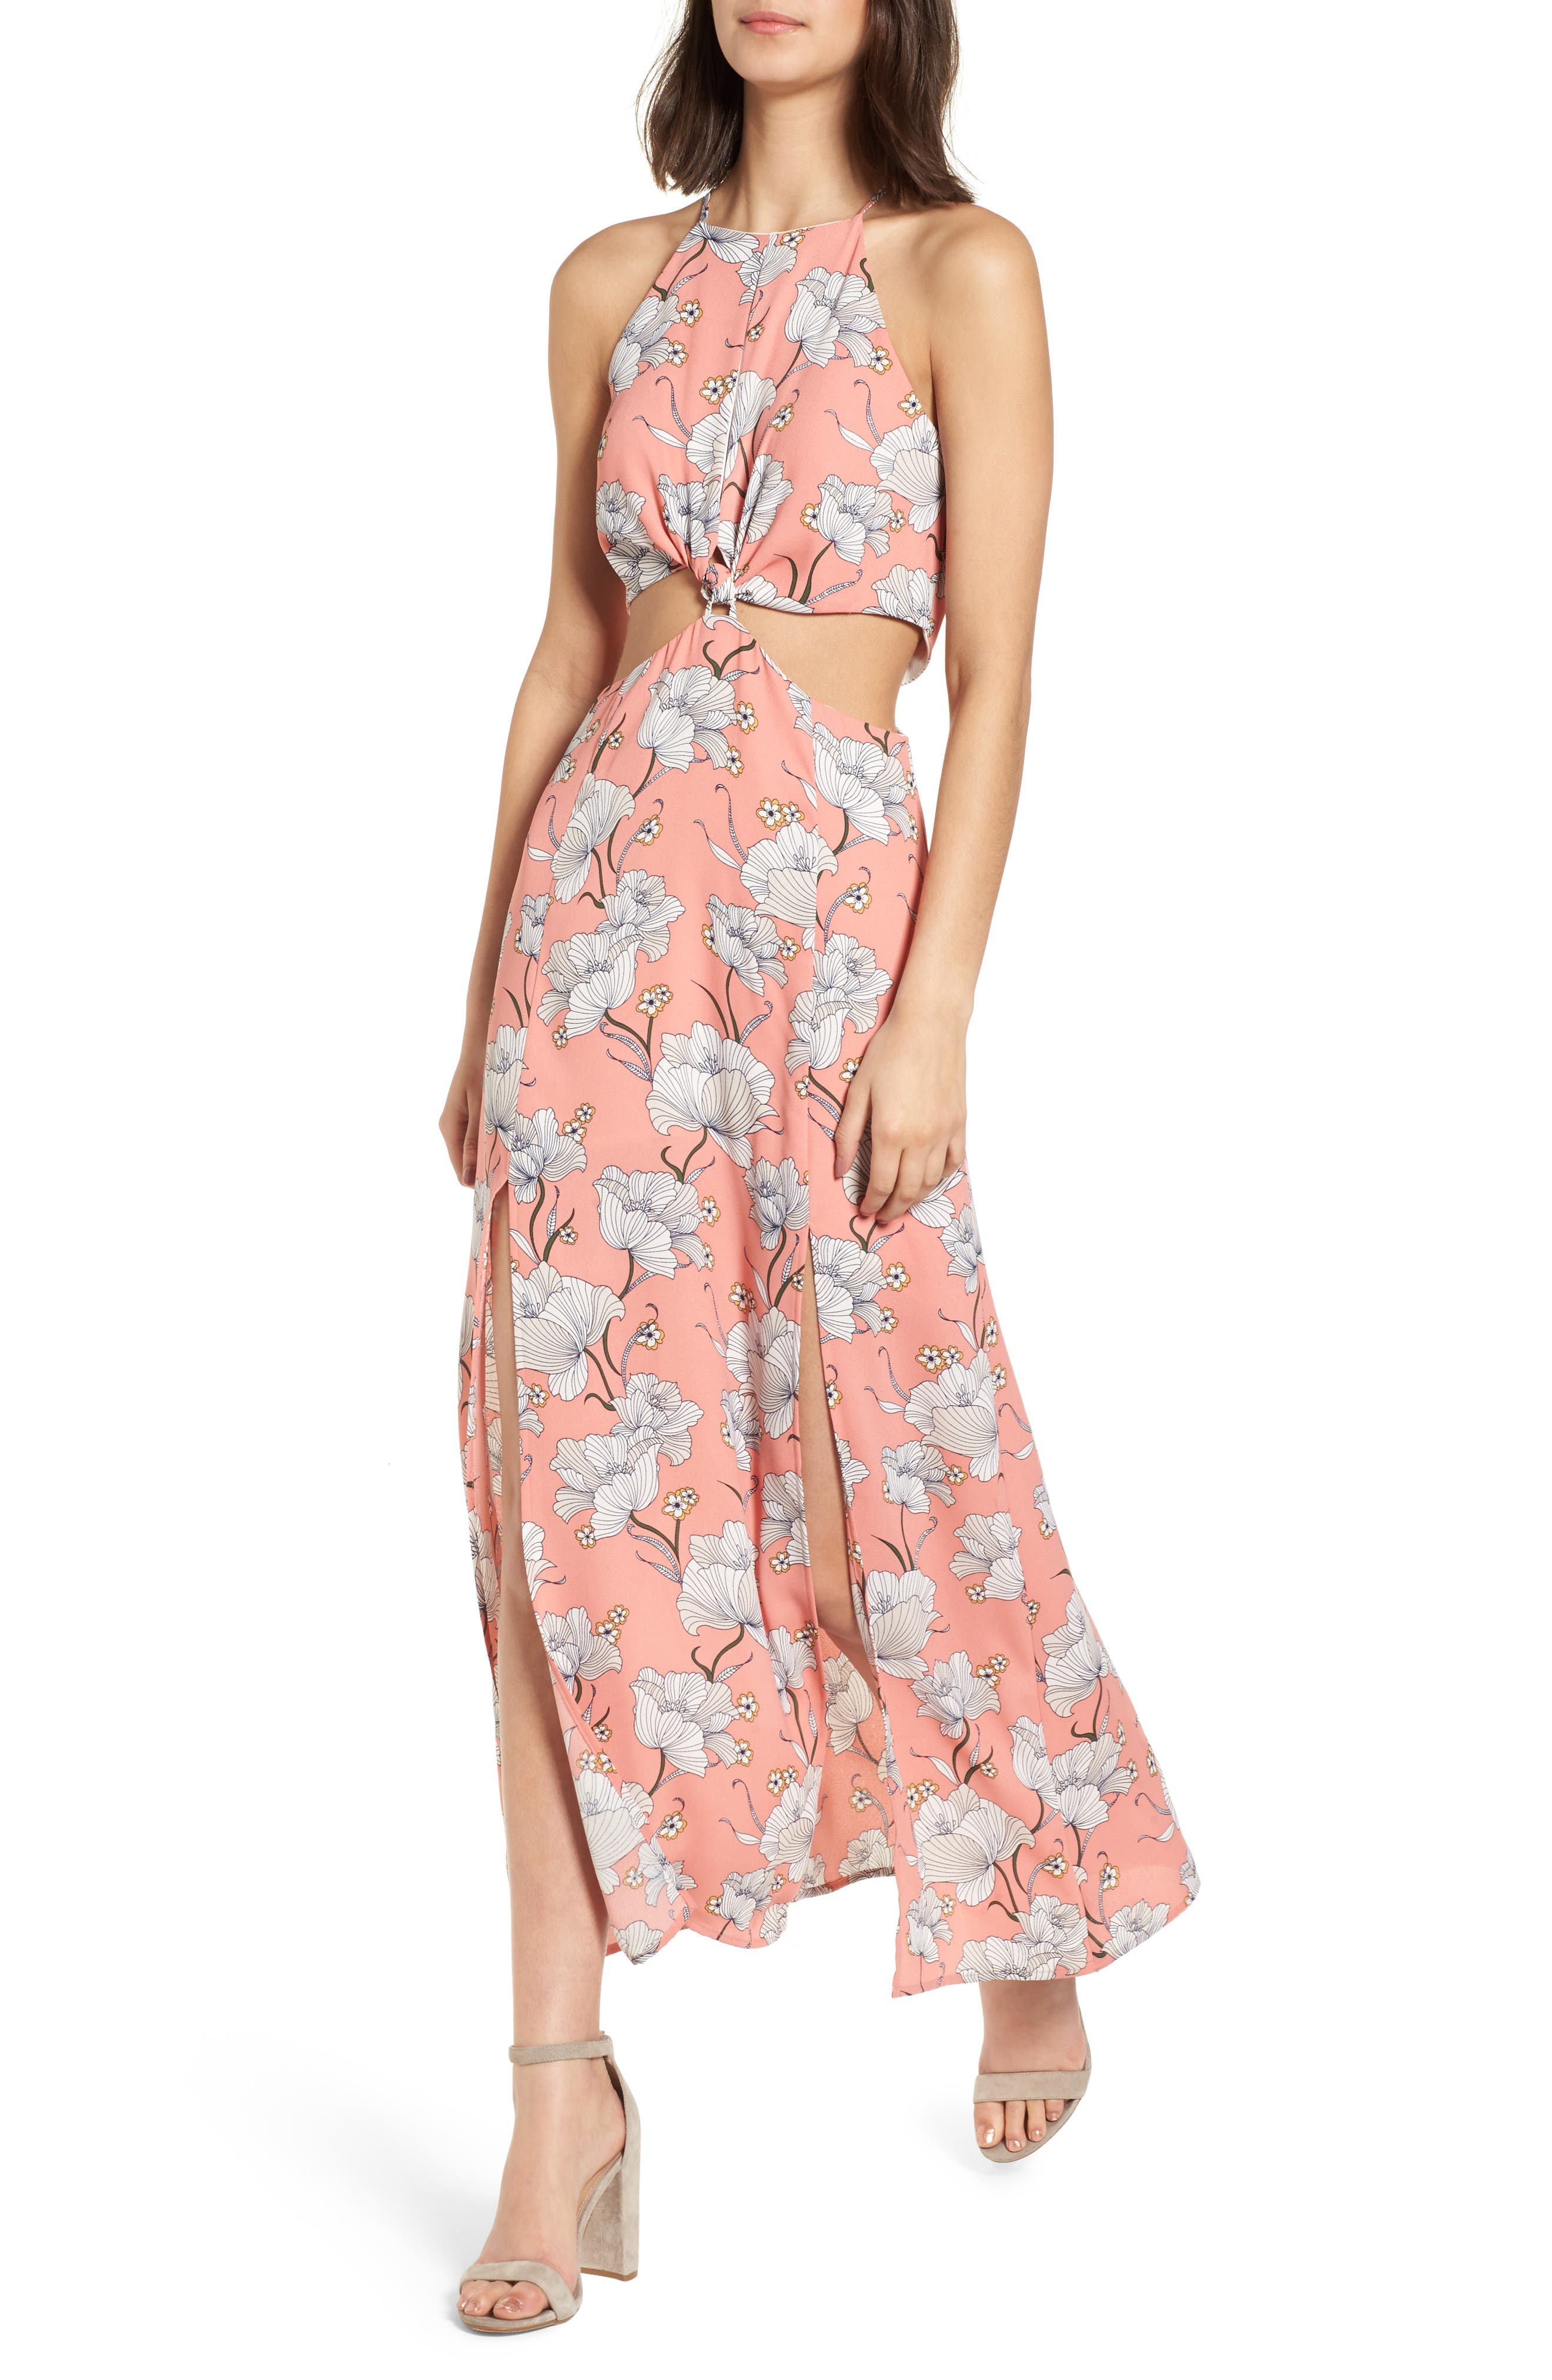 Floral Cutout Maxi Dress